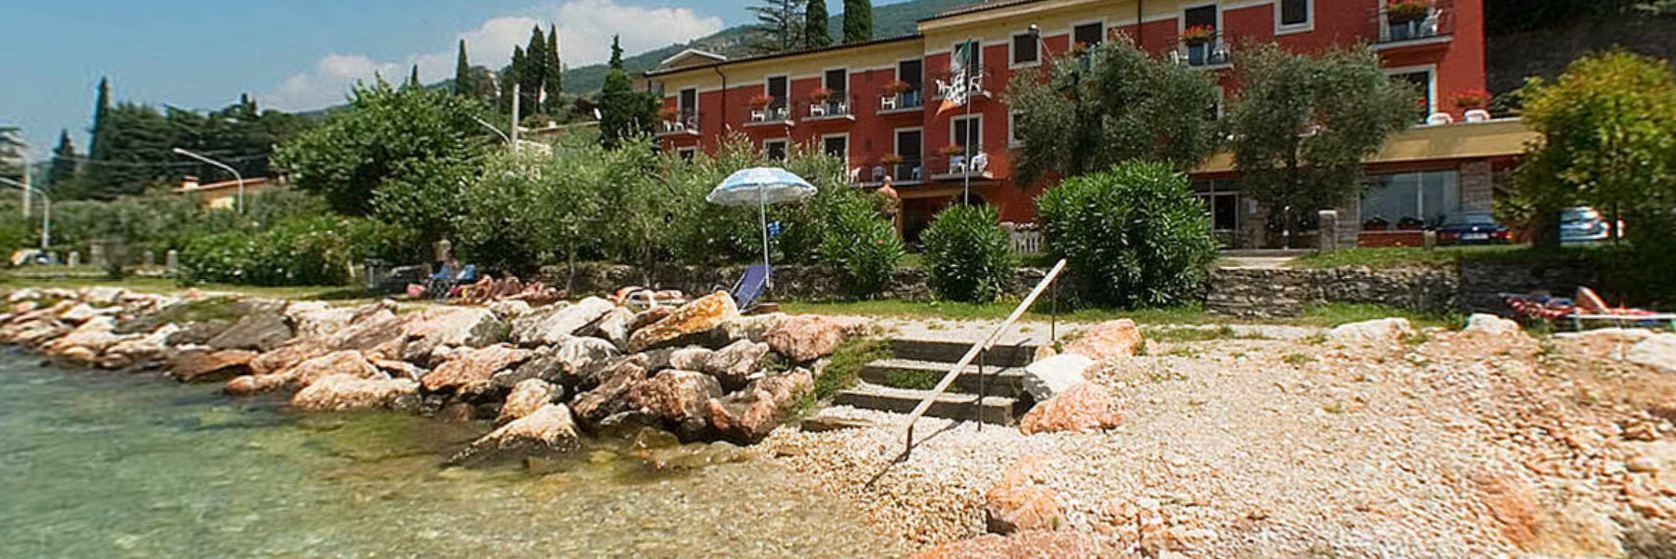 hotel-ristorante-menapace-torri-del-benaco-09.jpg